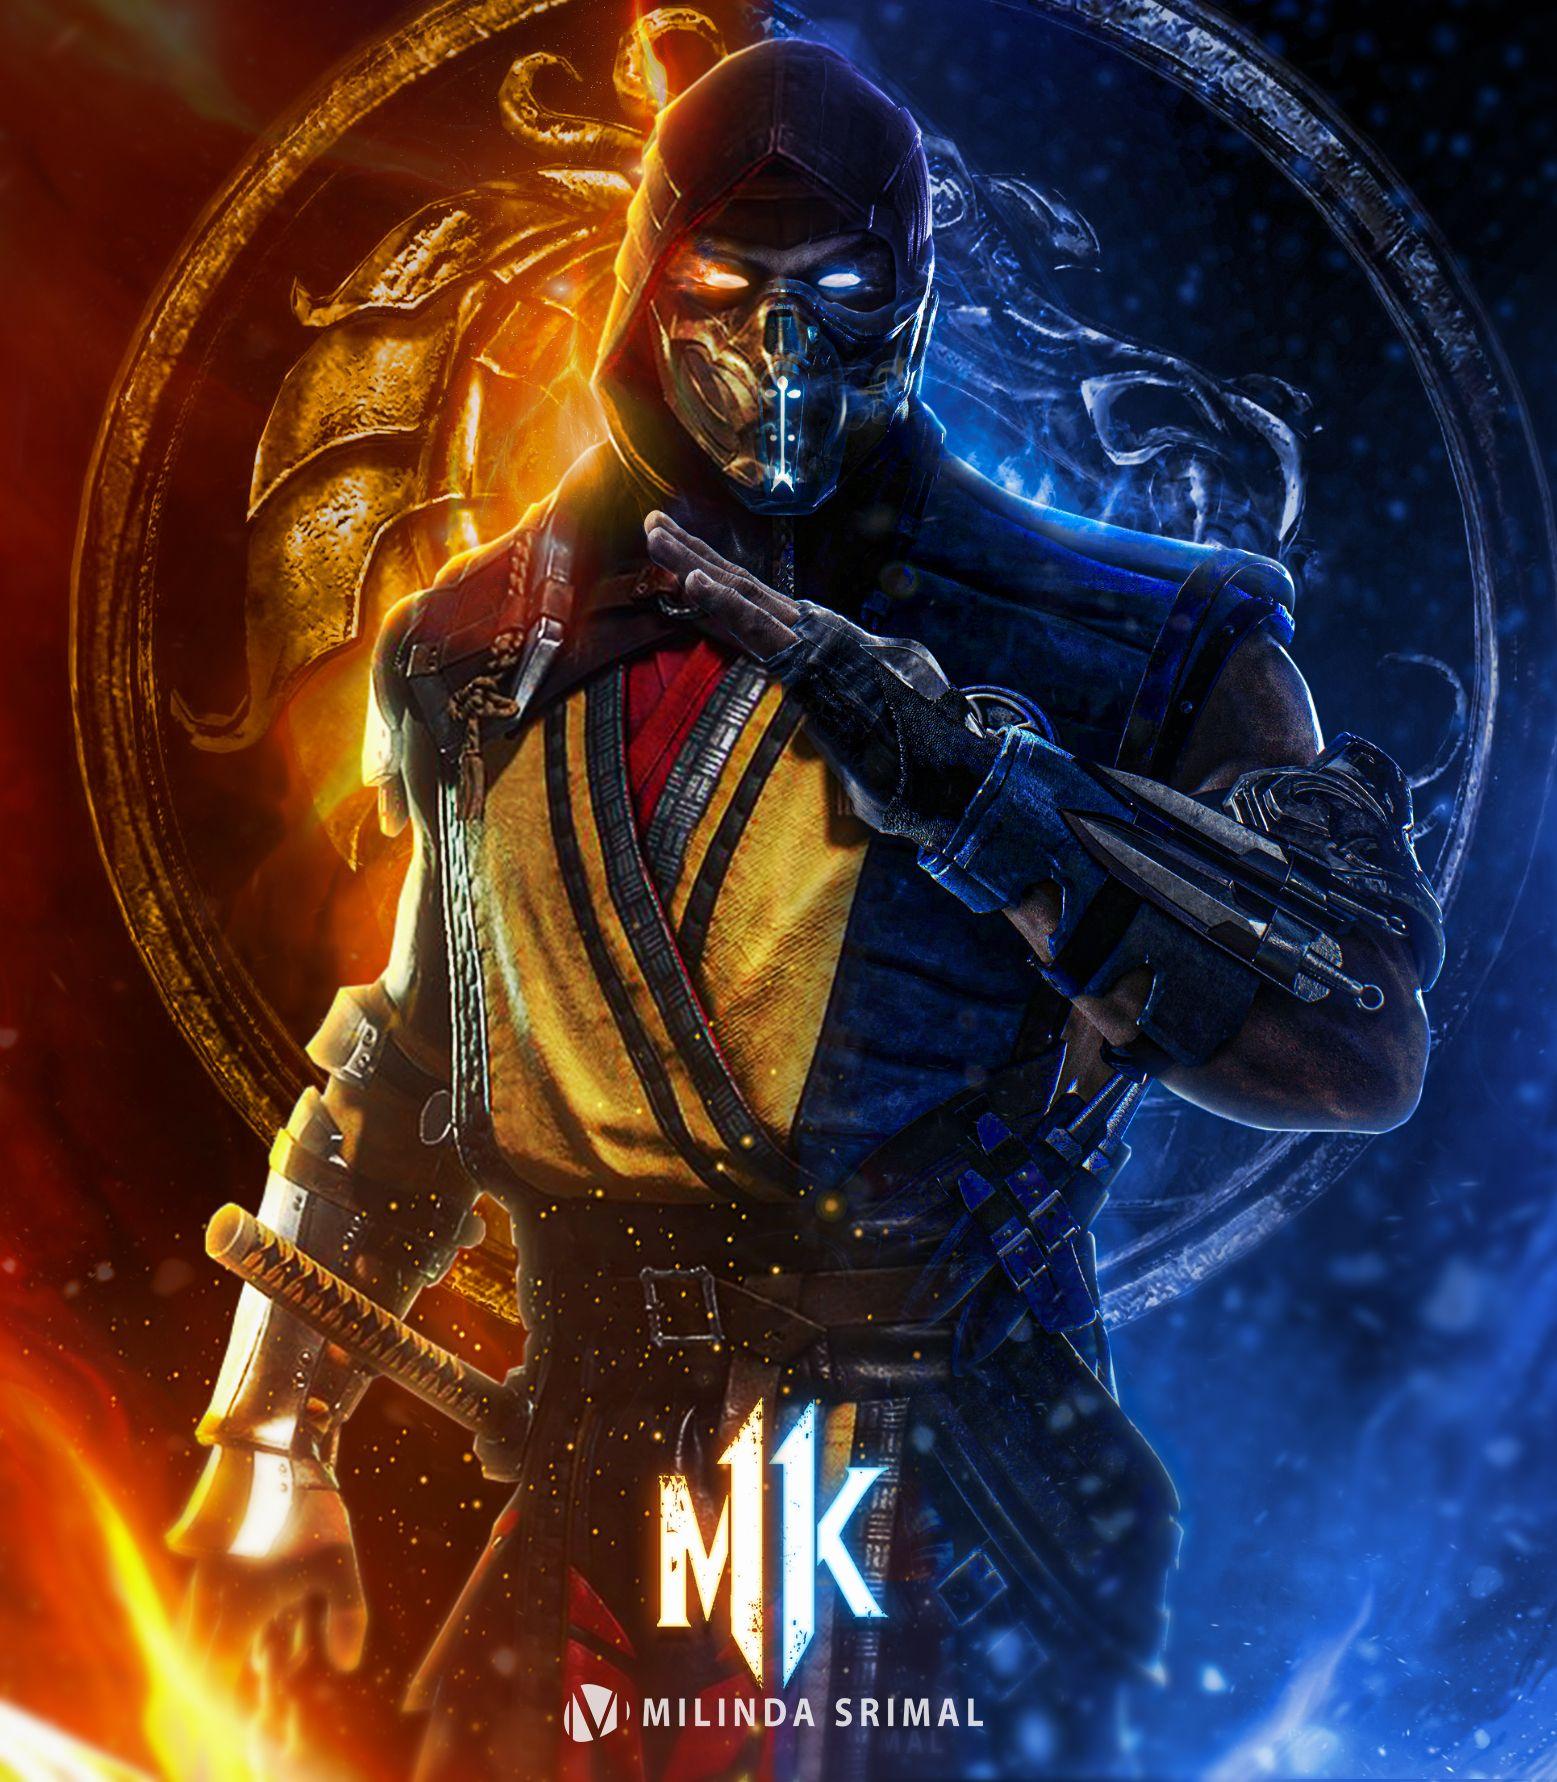 Scorpion Vs Sub Zero Mortal Kombat Movie Em 2020 Personagens